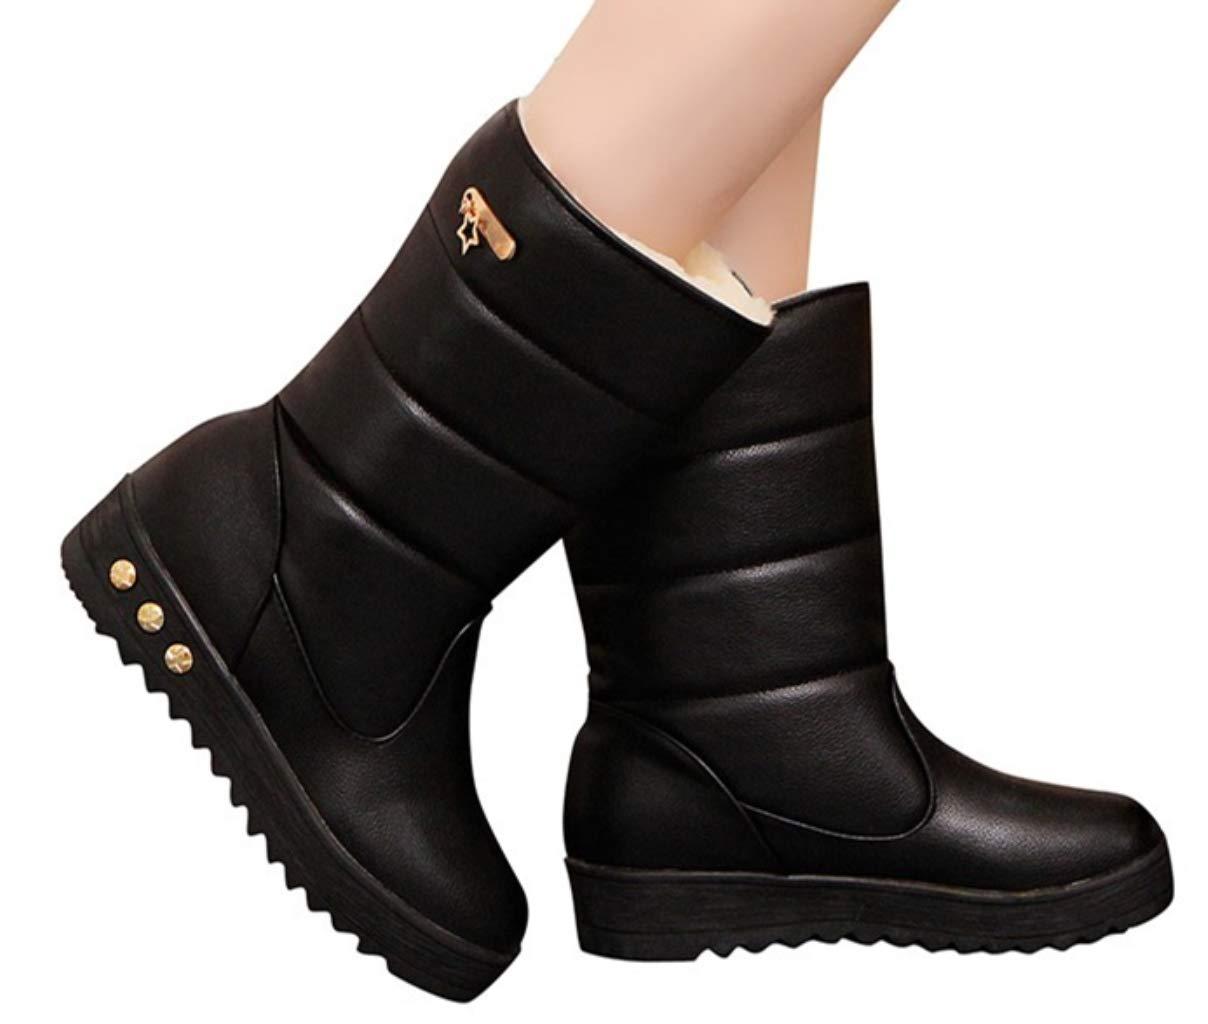 193ec95a9 ایگرد - خرید از آمازون | Hemlock Waterproof Snow Boots Women PU ...